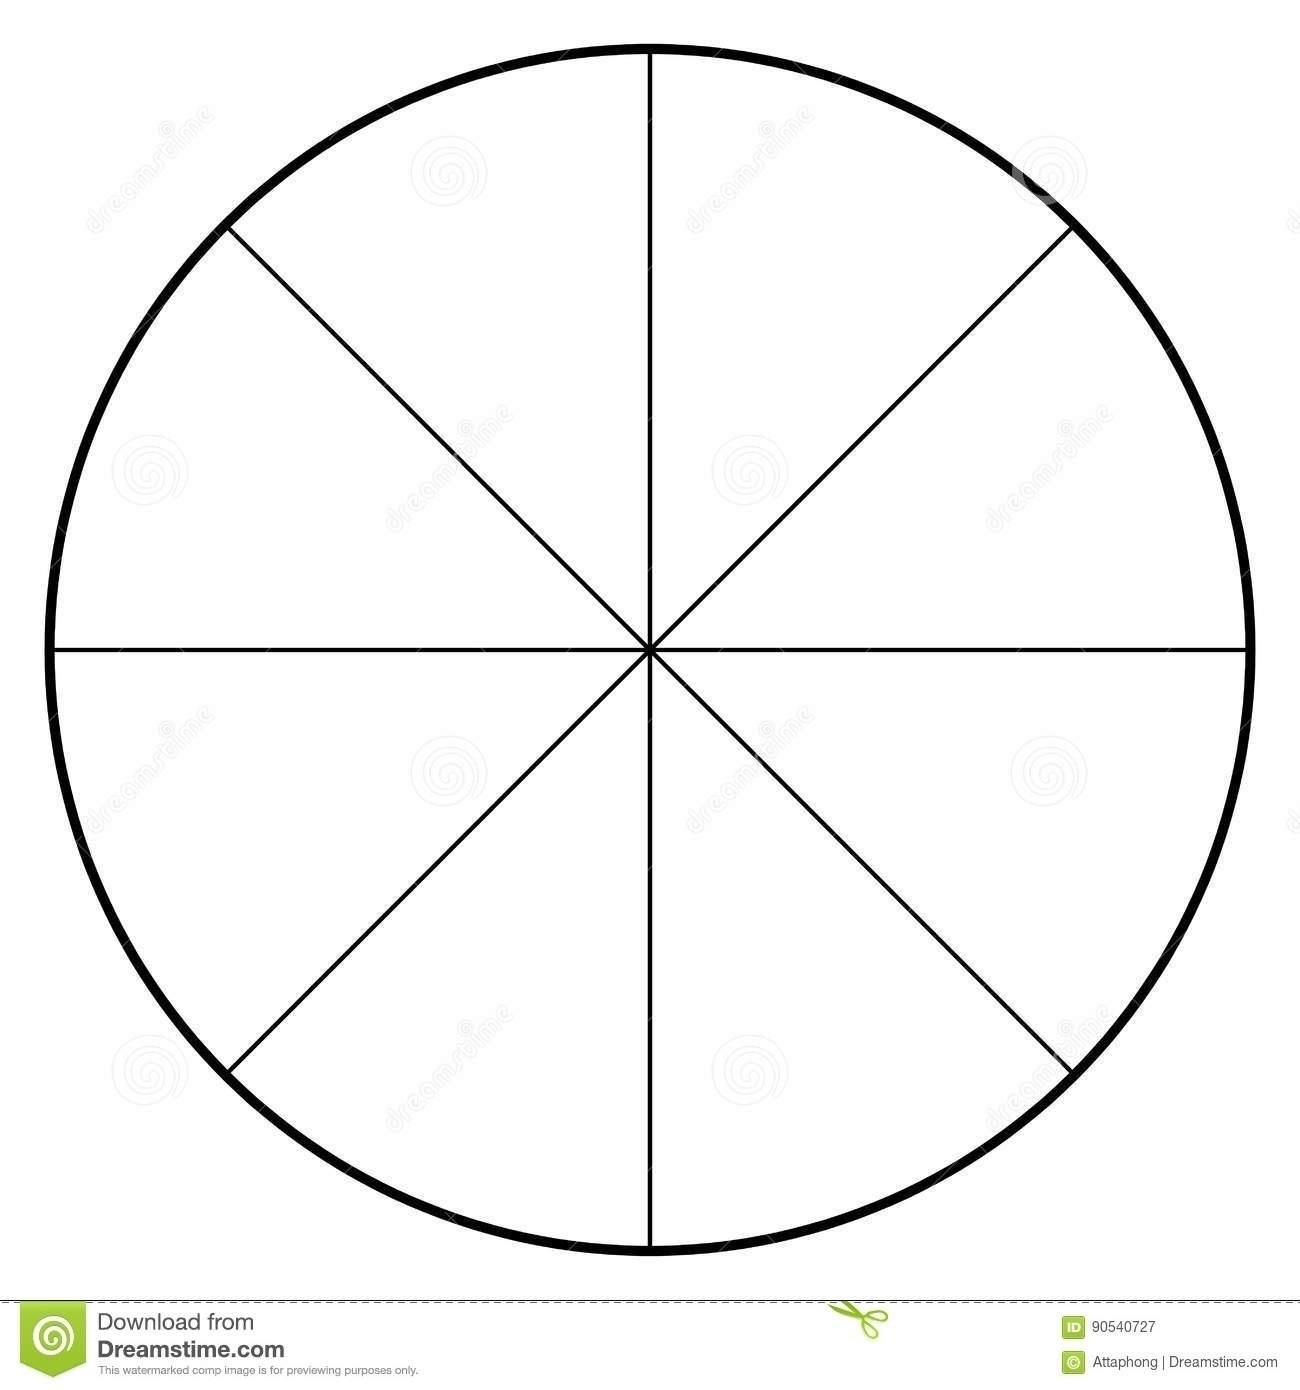 Blank Pie Chart 2018 | Corner Of Chart And Menu - Free Printable Pie Chart